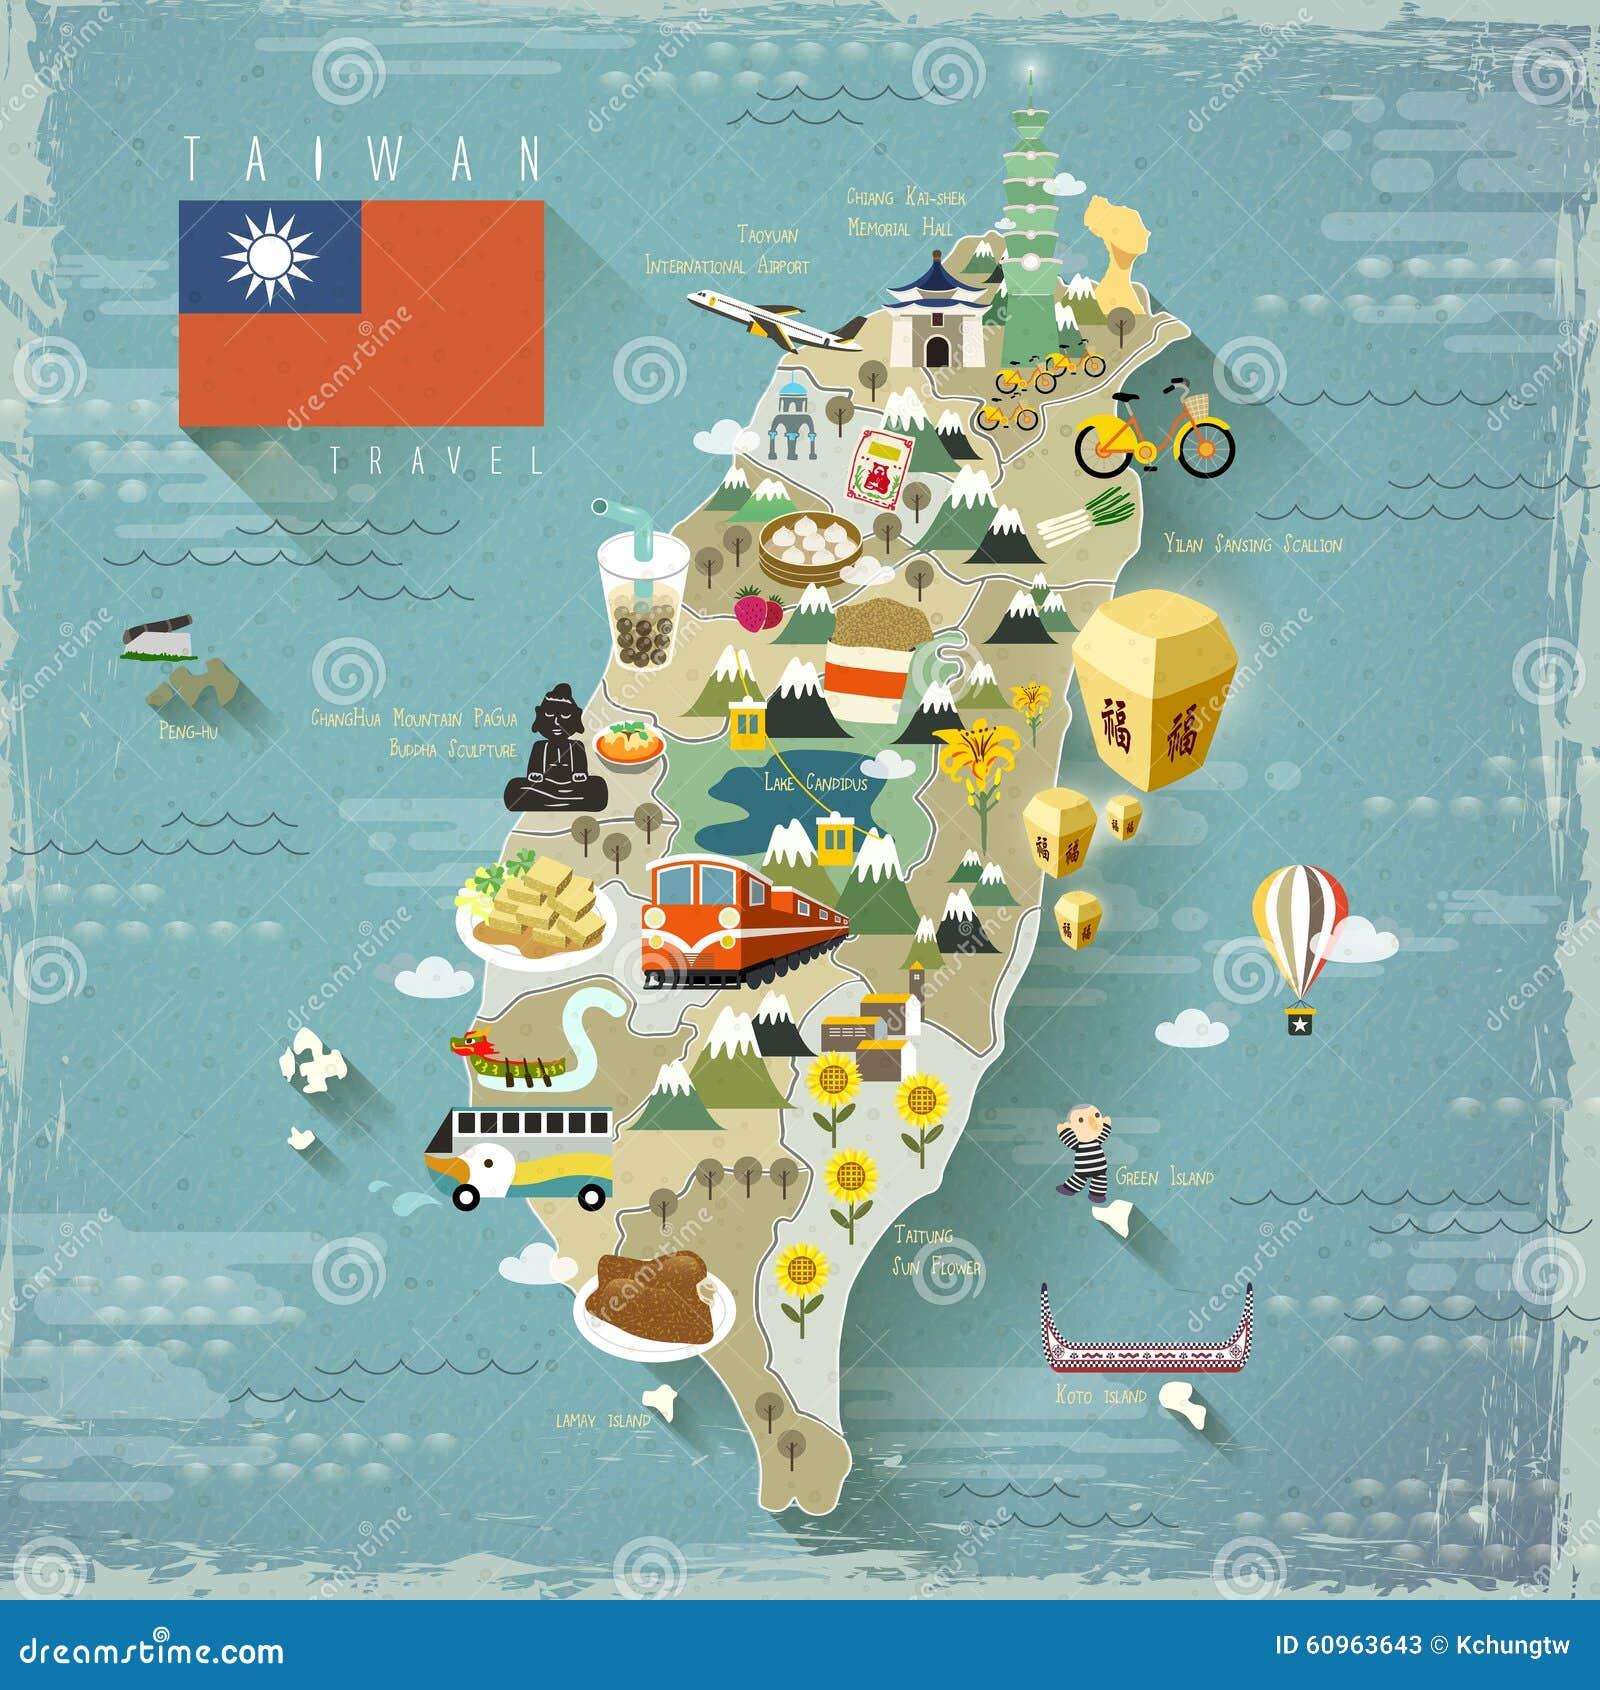 taiwan travel map illustration 60963643 megapixl